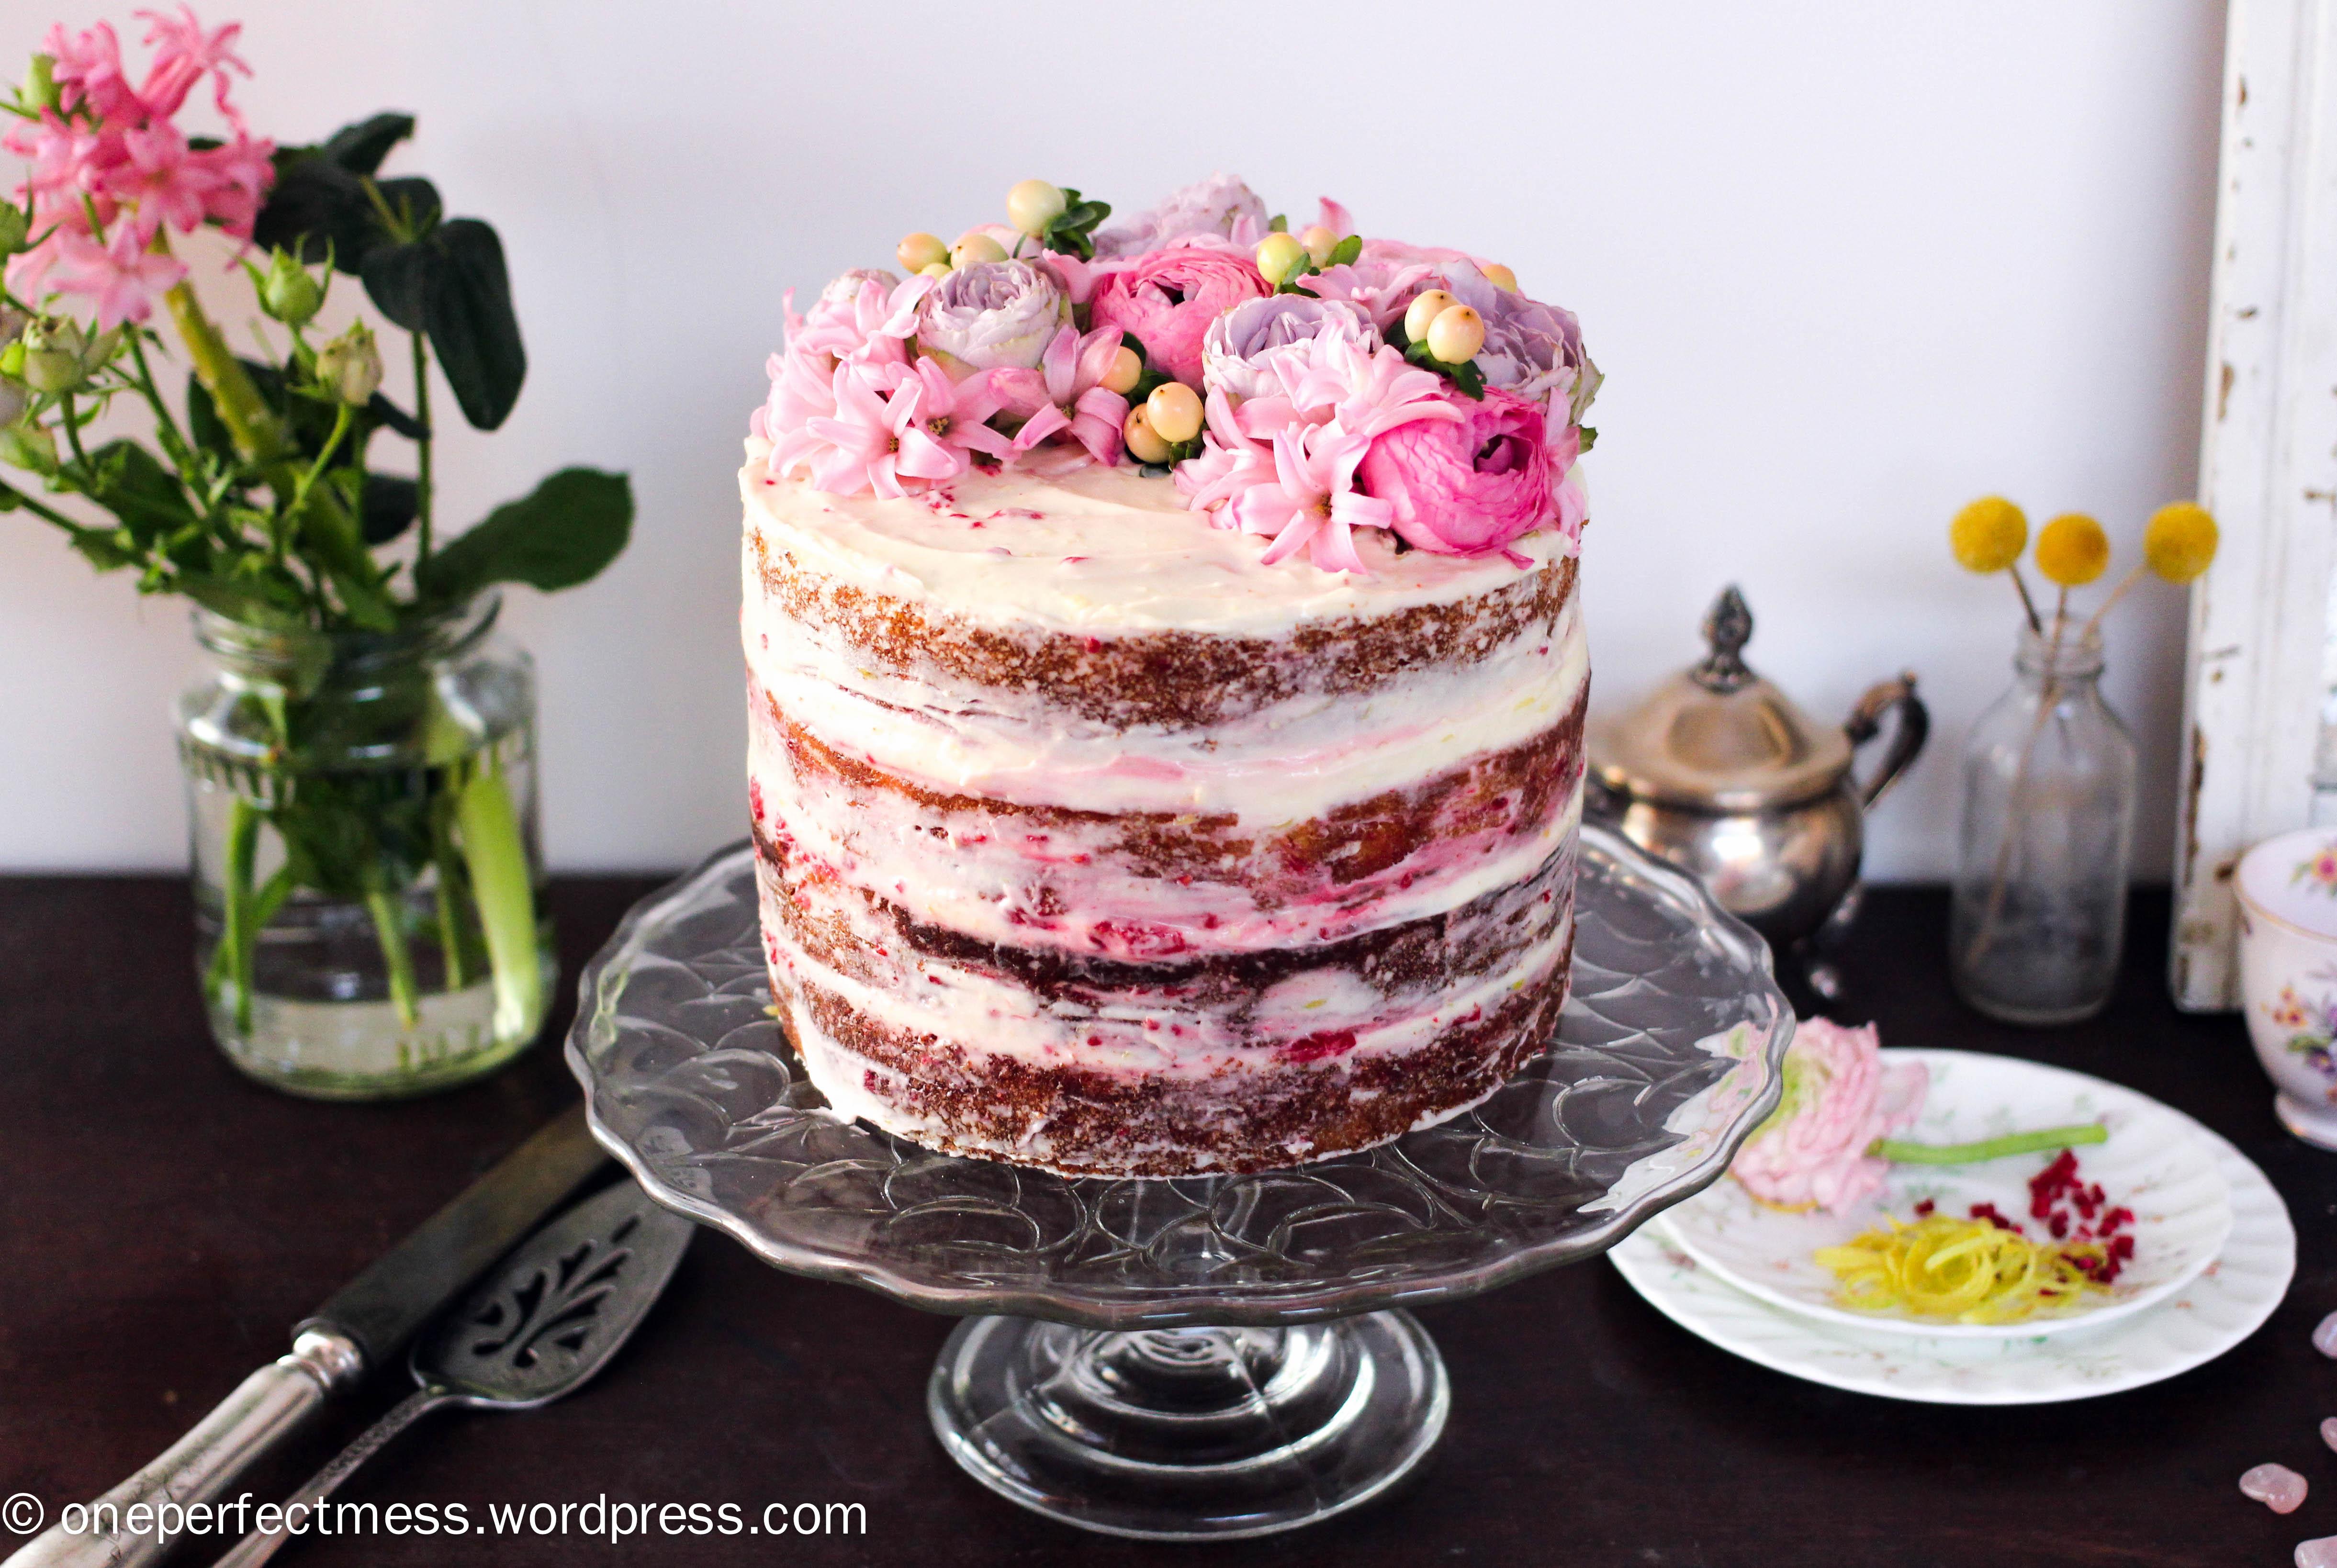 Raspberry and cream sponge cake recipe - Good cake recipes